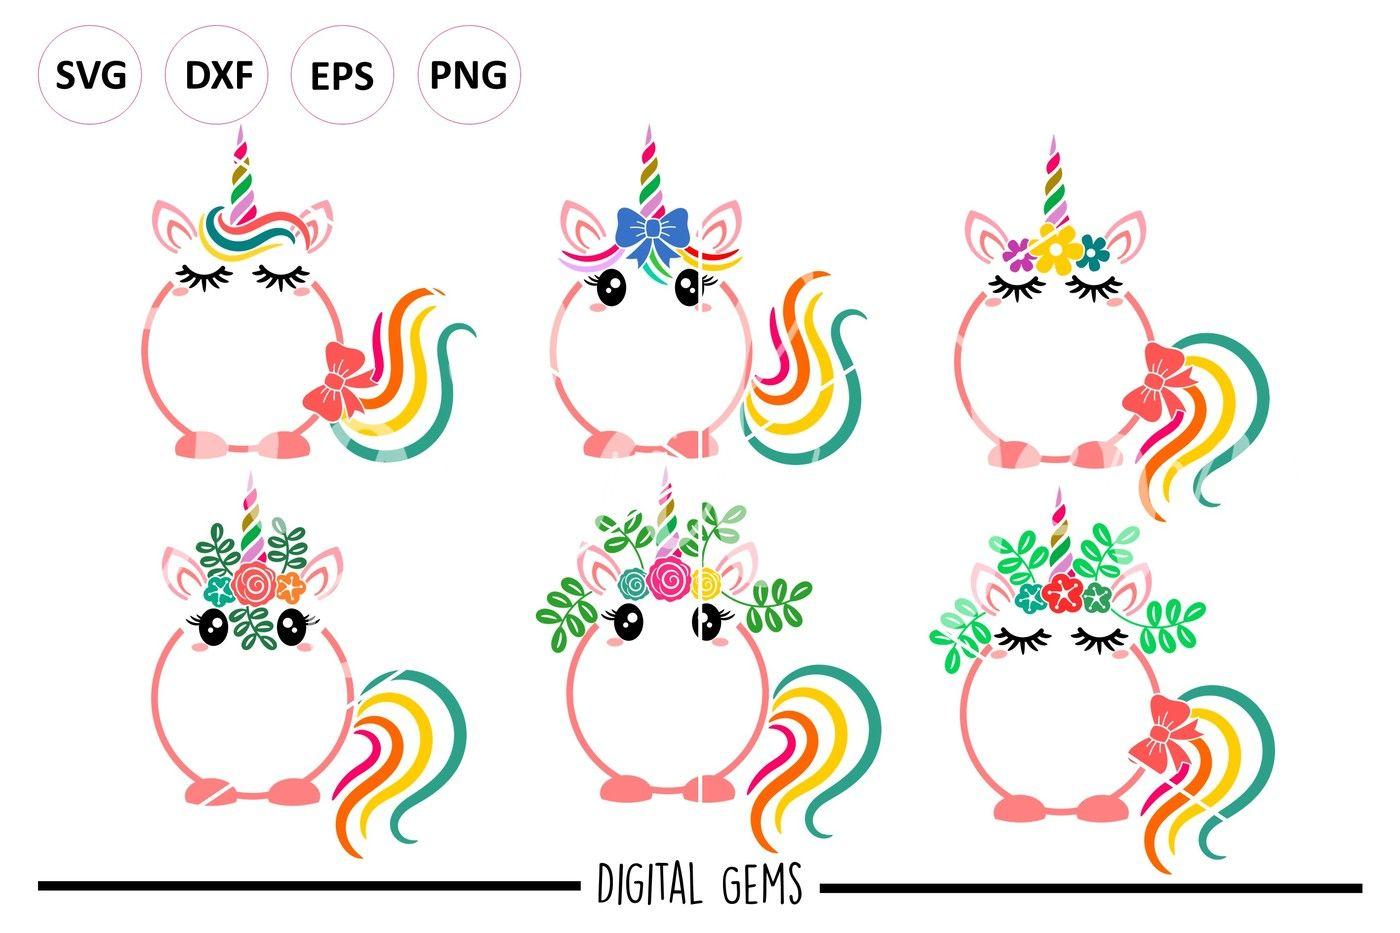 Unicorn Svg Dxf Eps Png Files By Digital Gems